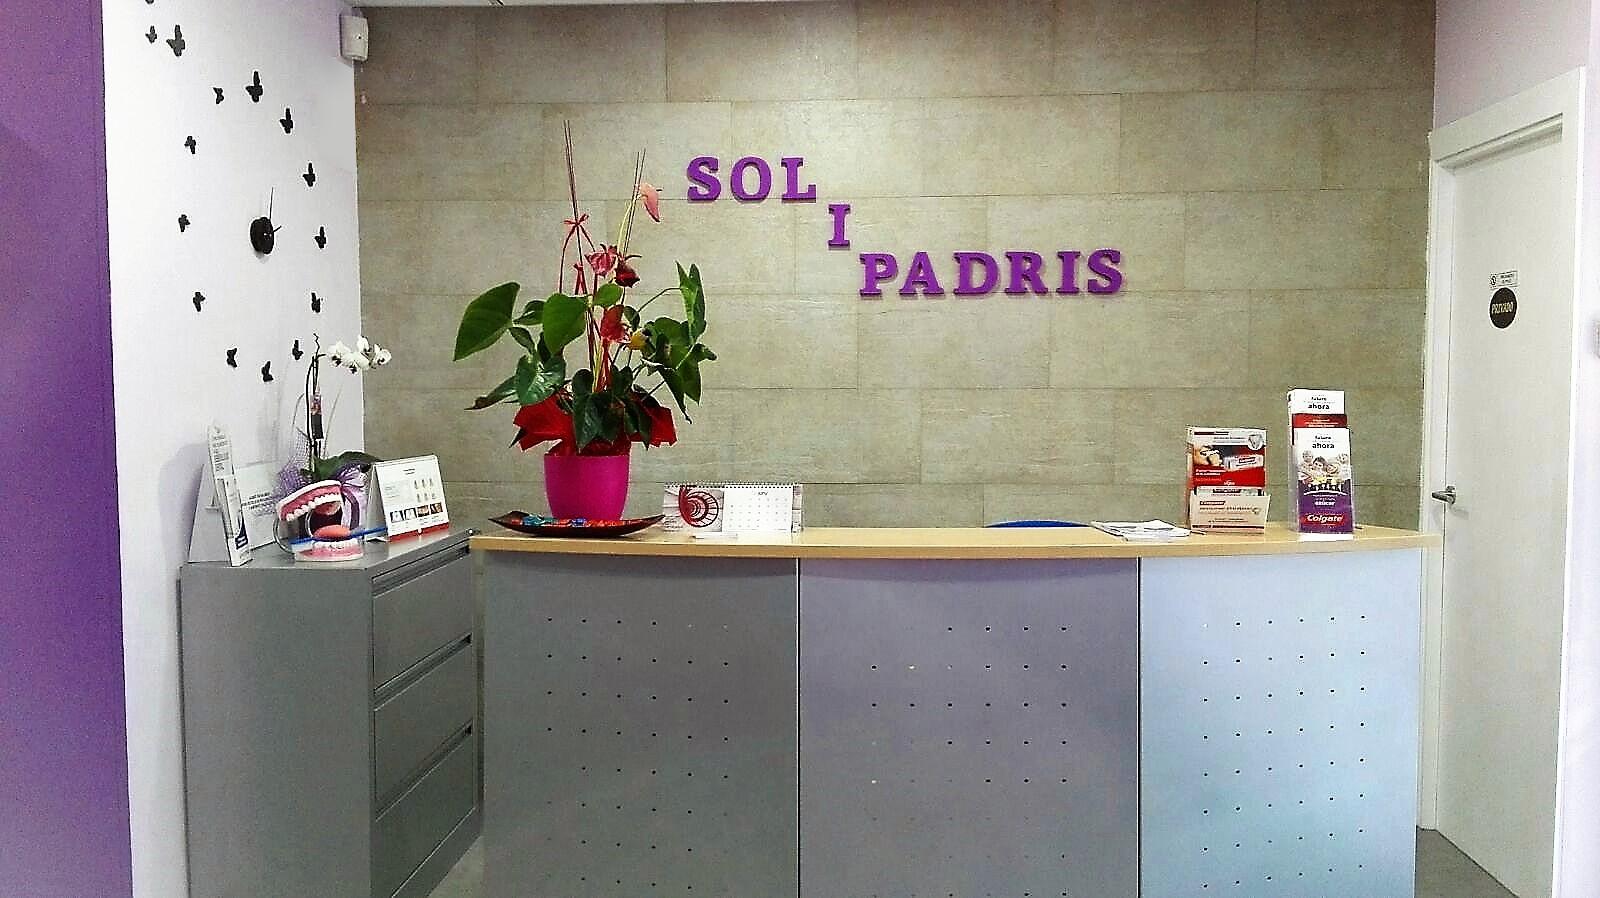 clinica dental sabadell sol i padris